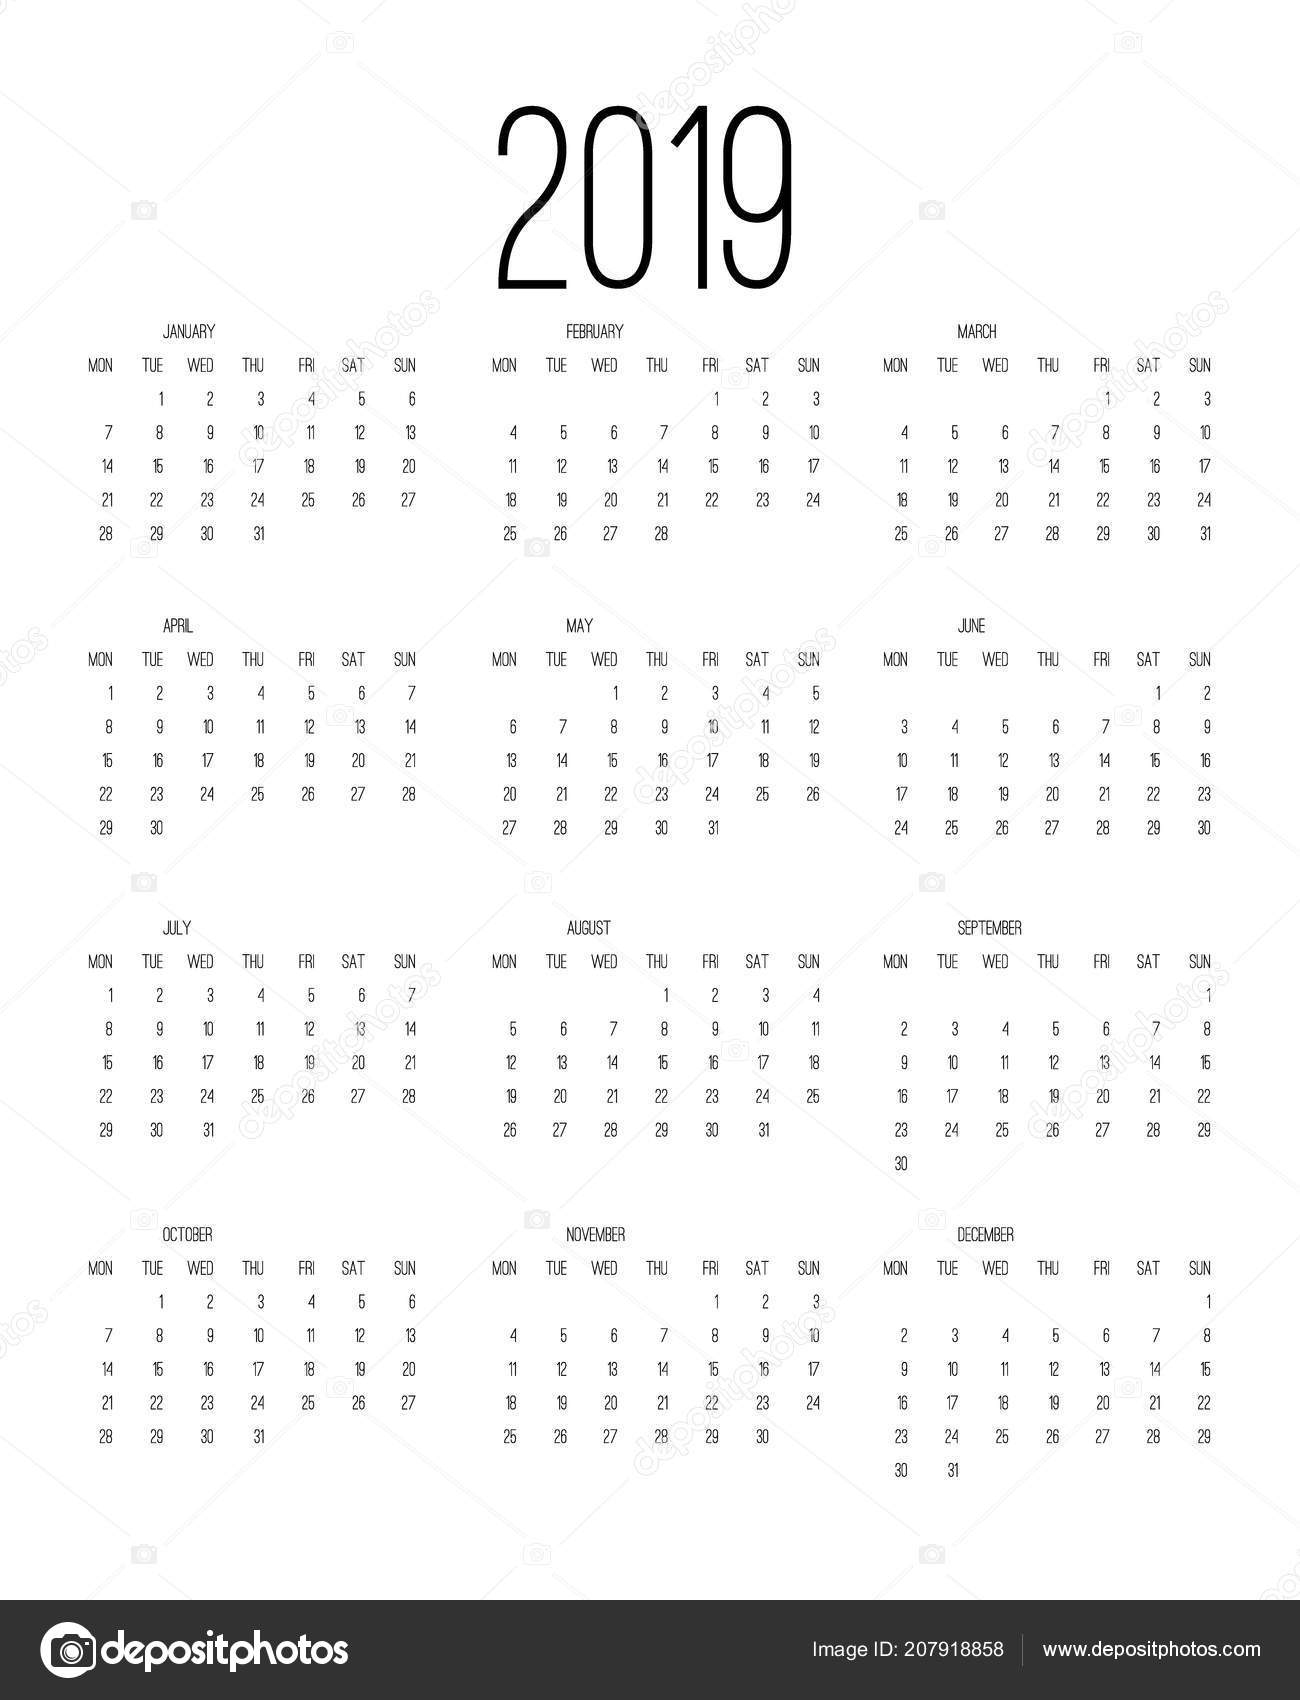 Calendario 2019 Week Number.Calendar 2019 Week Starts Sunday Business Template Vector